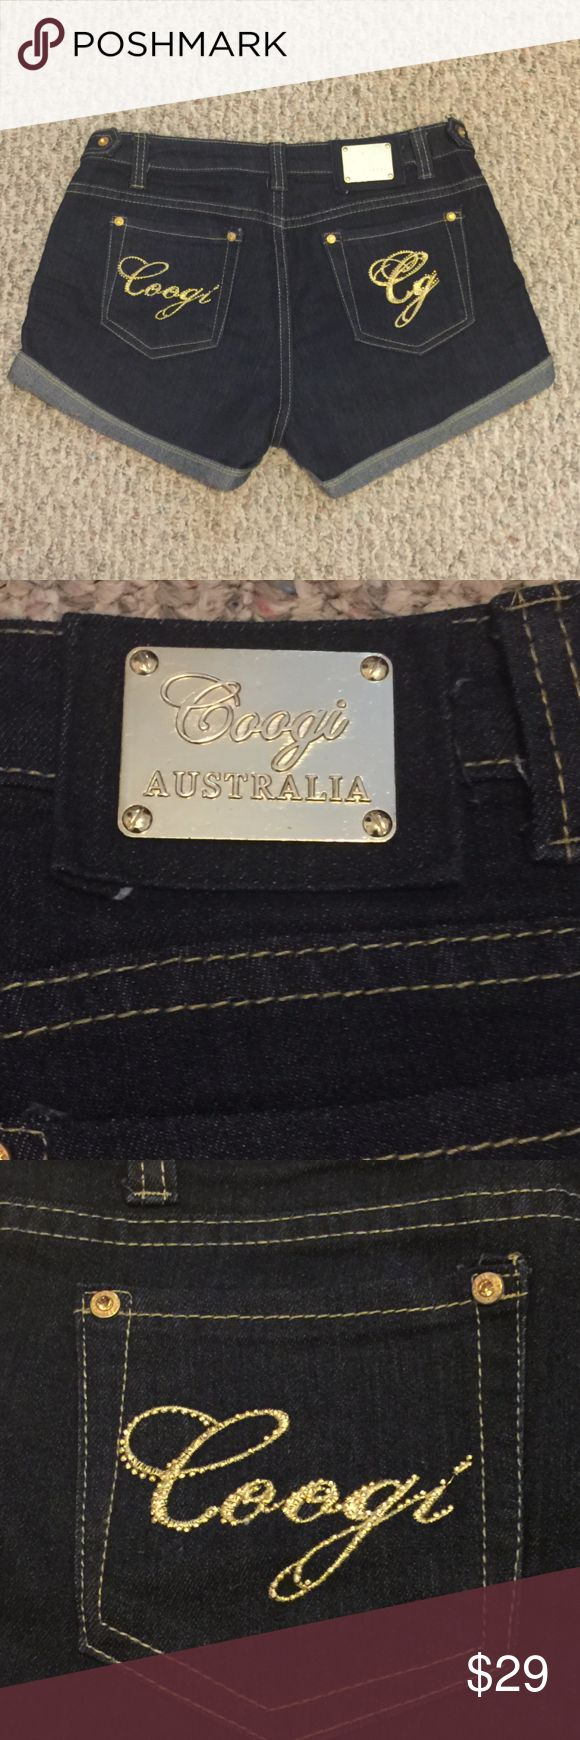 "COOGI Australia Womens Jean Denim Shorts  SZ 7/8 Gorgeous Gold embroidery at the back pockets   Waist - 30"" Rise - 8.5"" 74% cotton  24% polyester  2% spandex COOGI Shorts Jean Shorts"